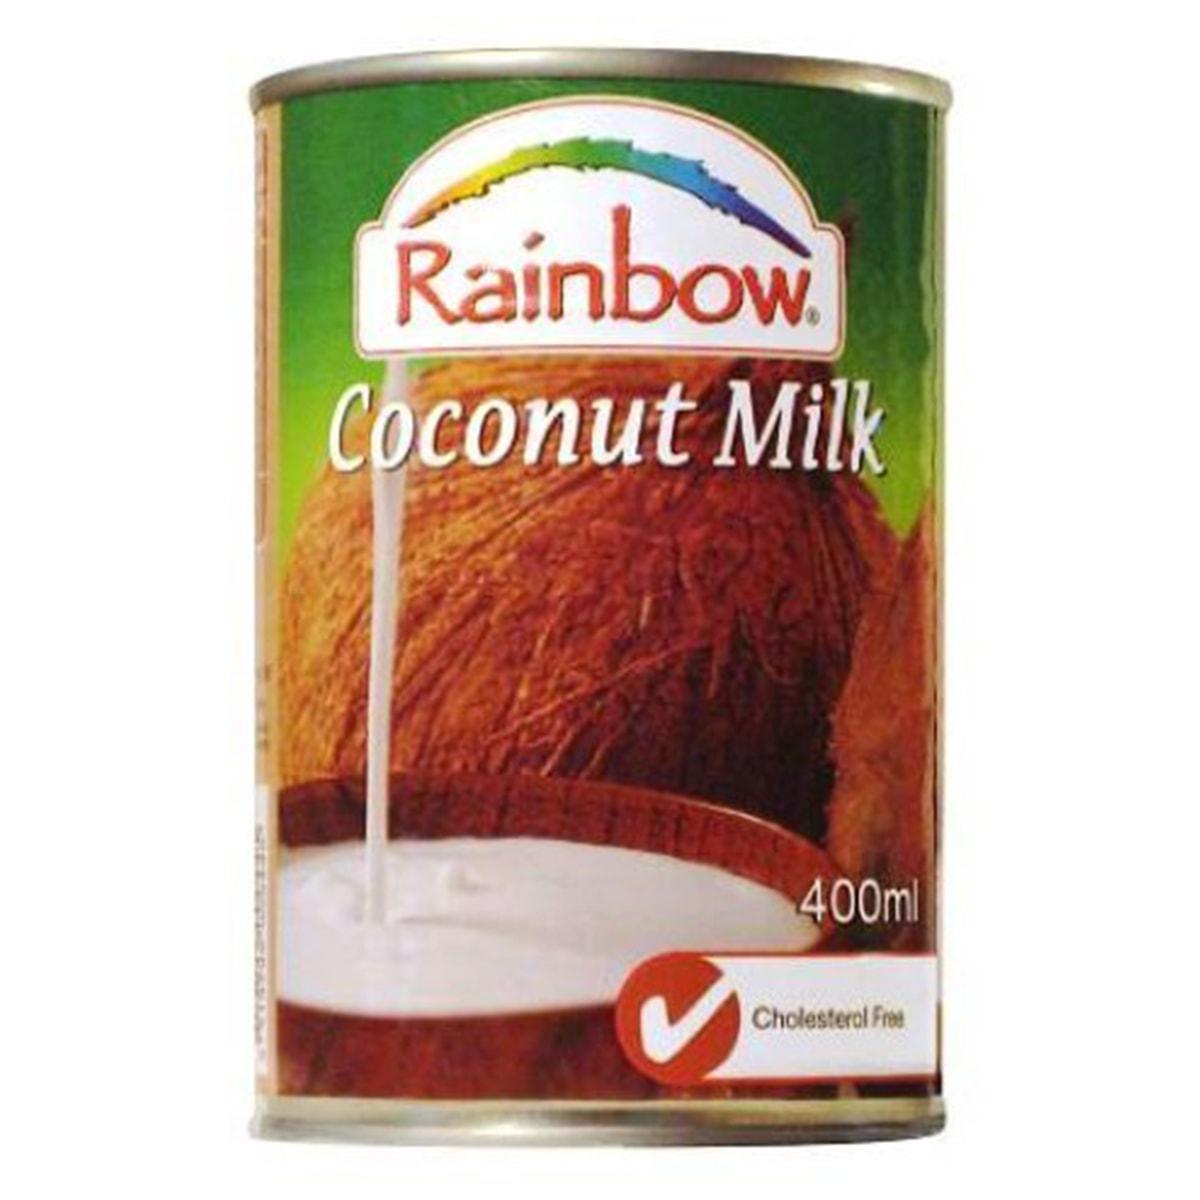 Buy Rainbow Coconut Milk - 400 ml